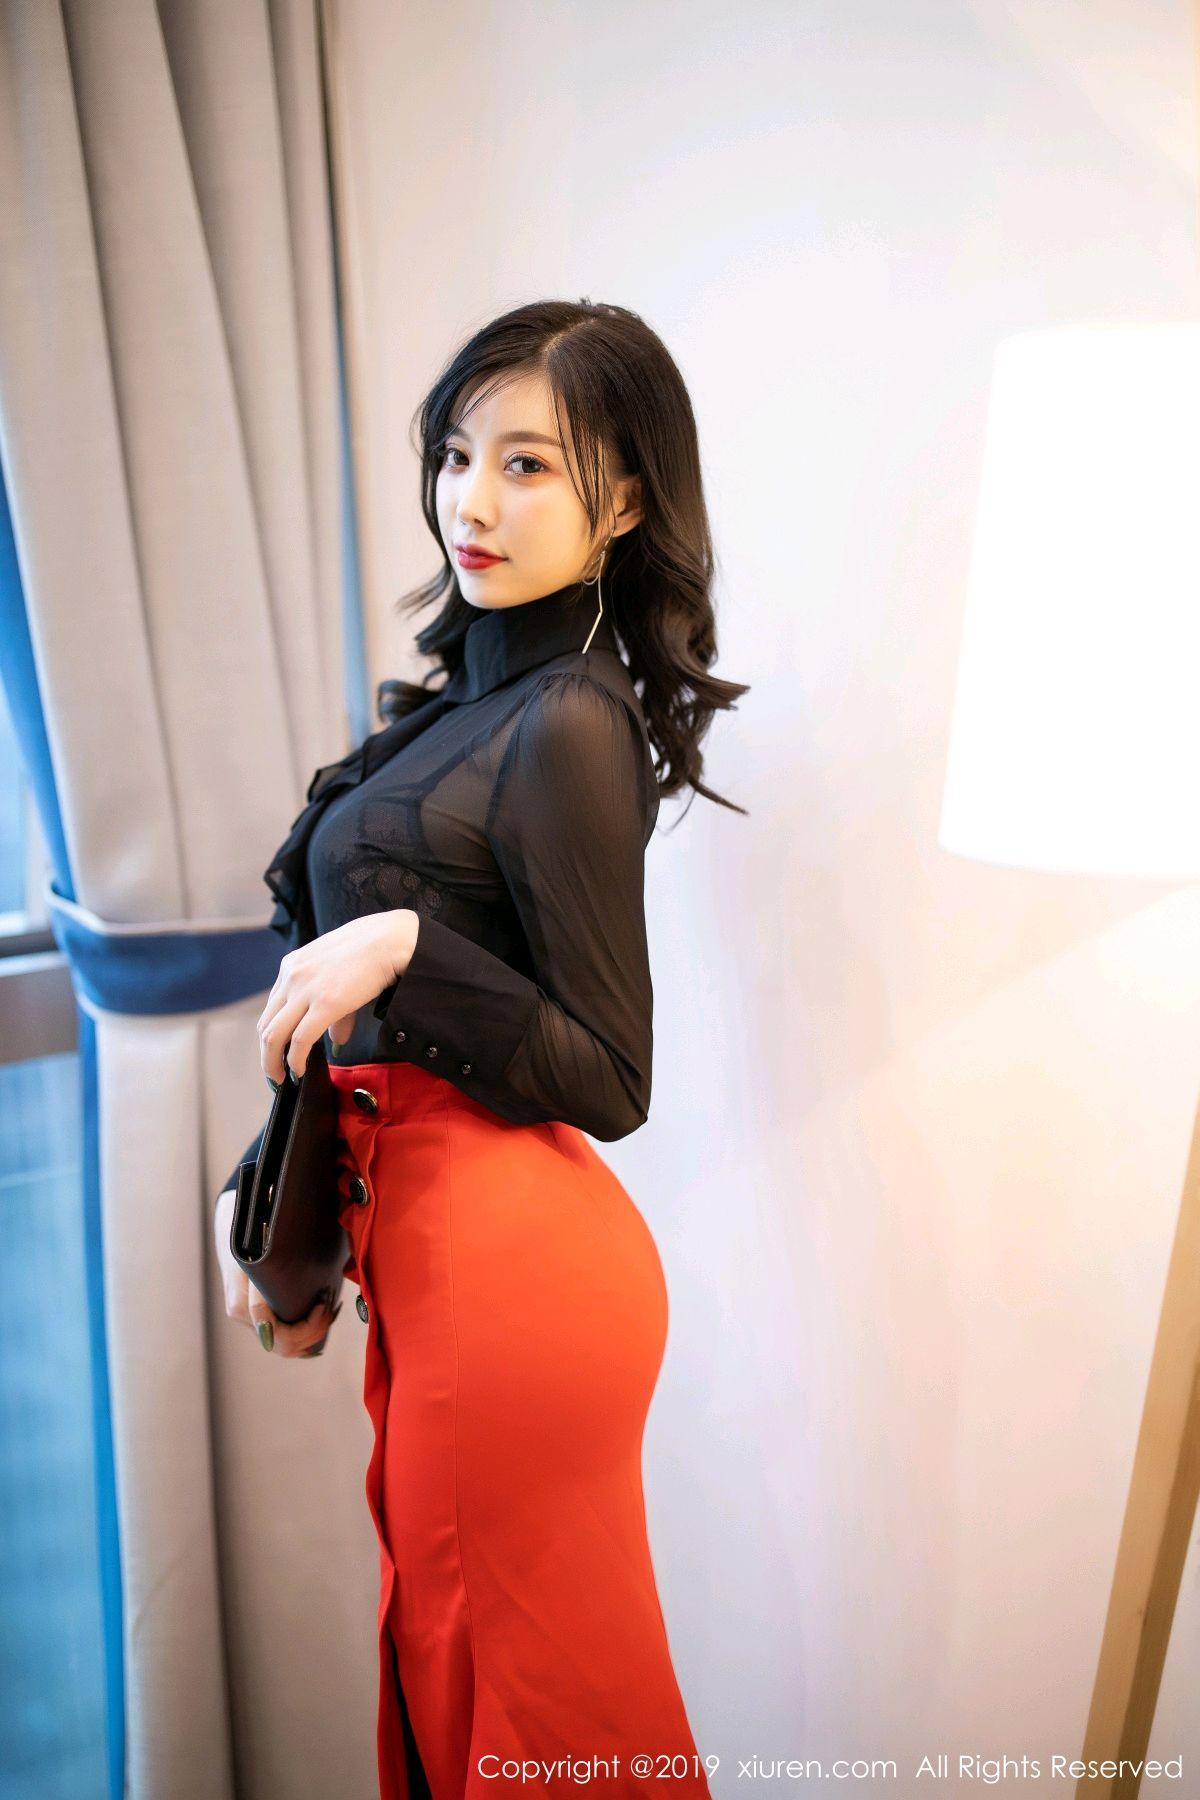 [XiuRen] Vol.1778 Yang Chen Chen 11P, Underwear, Xiuren, Yang Chen Chen